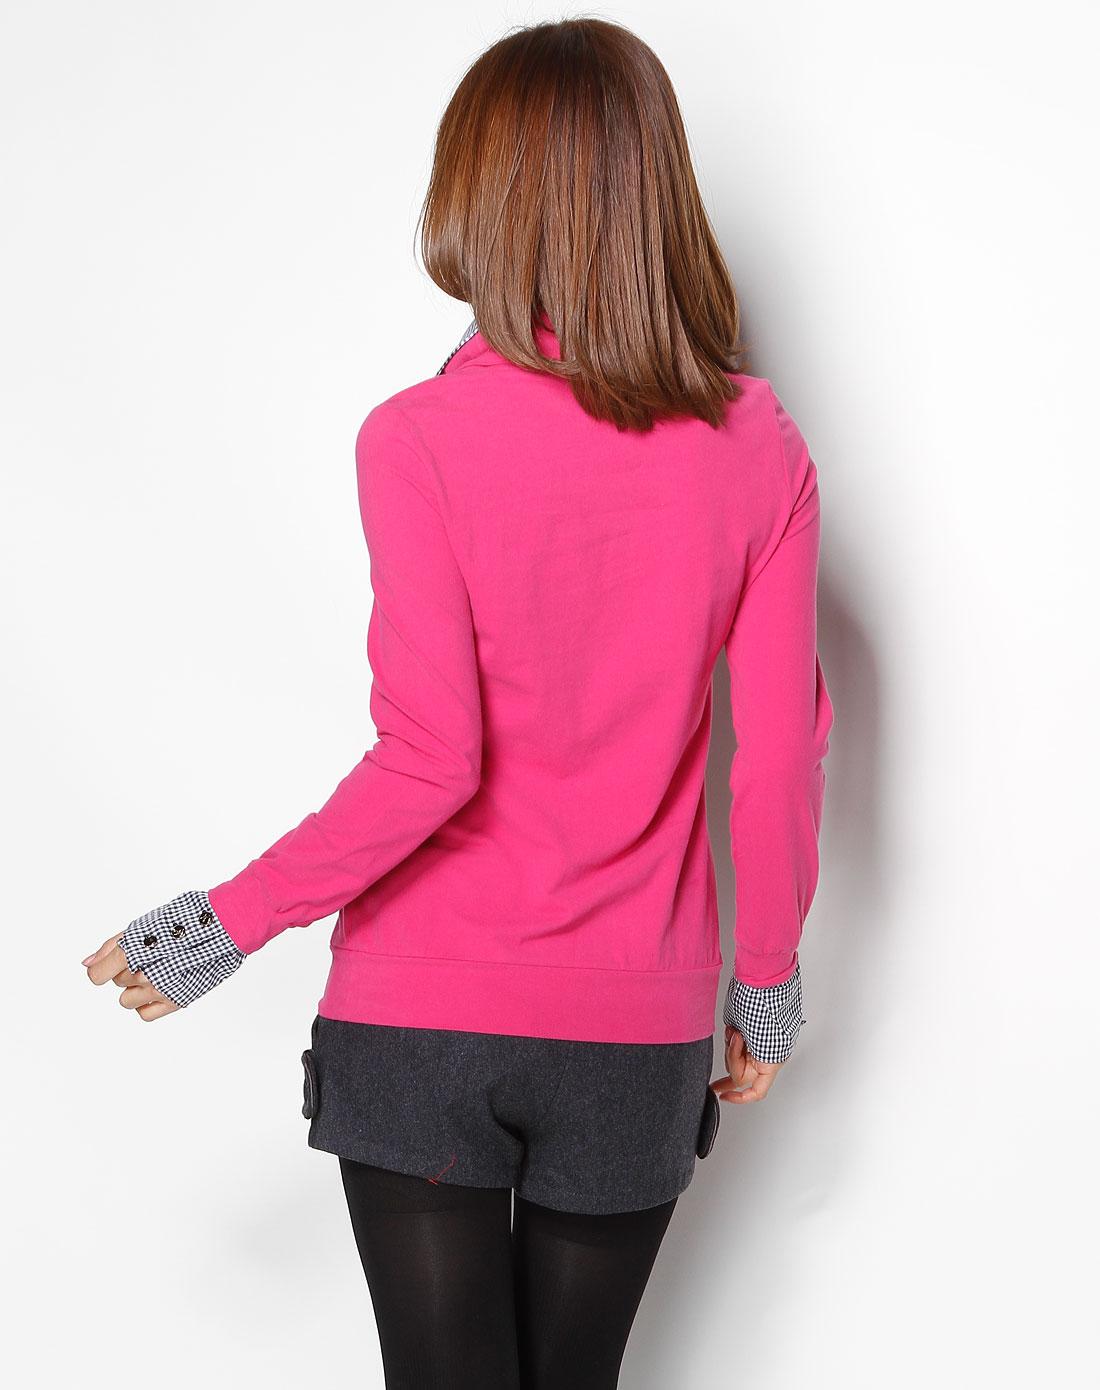 r&d玫红色珠片图案长袖针织衫6104707162423